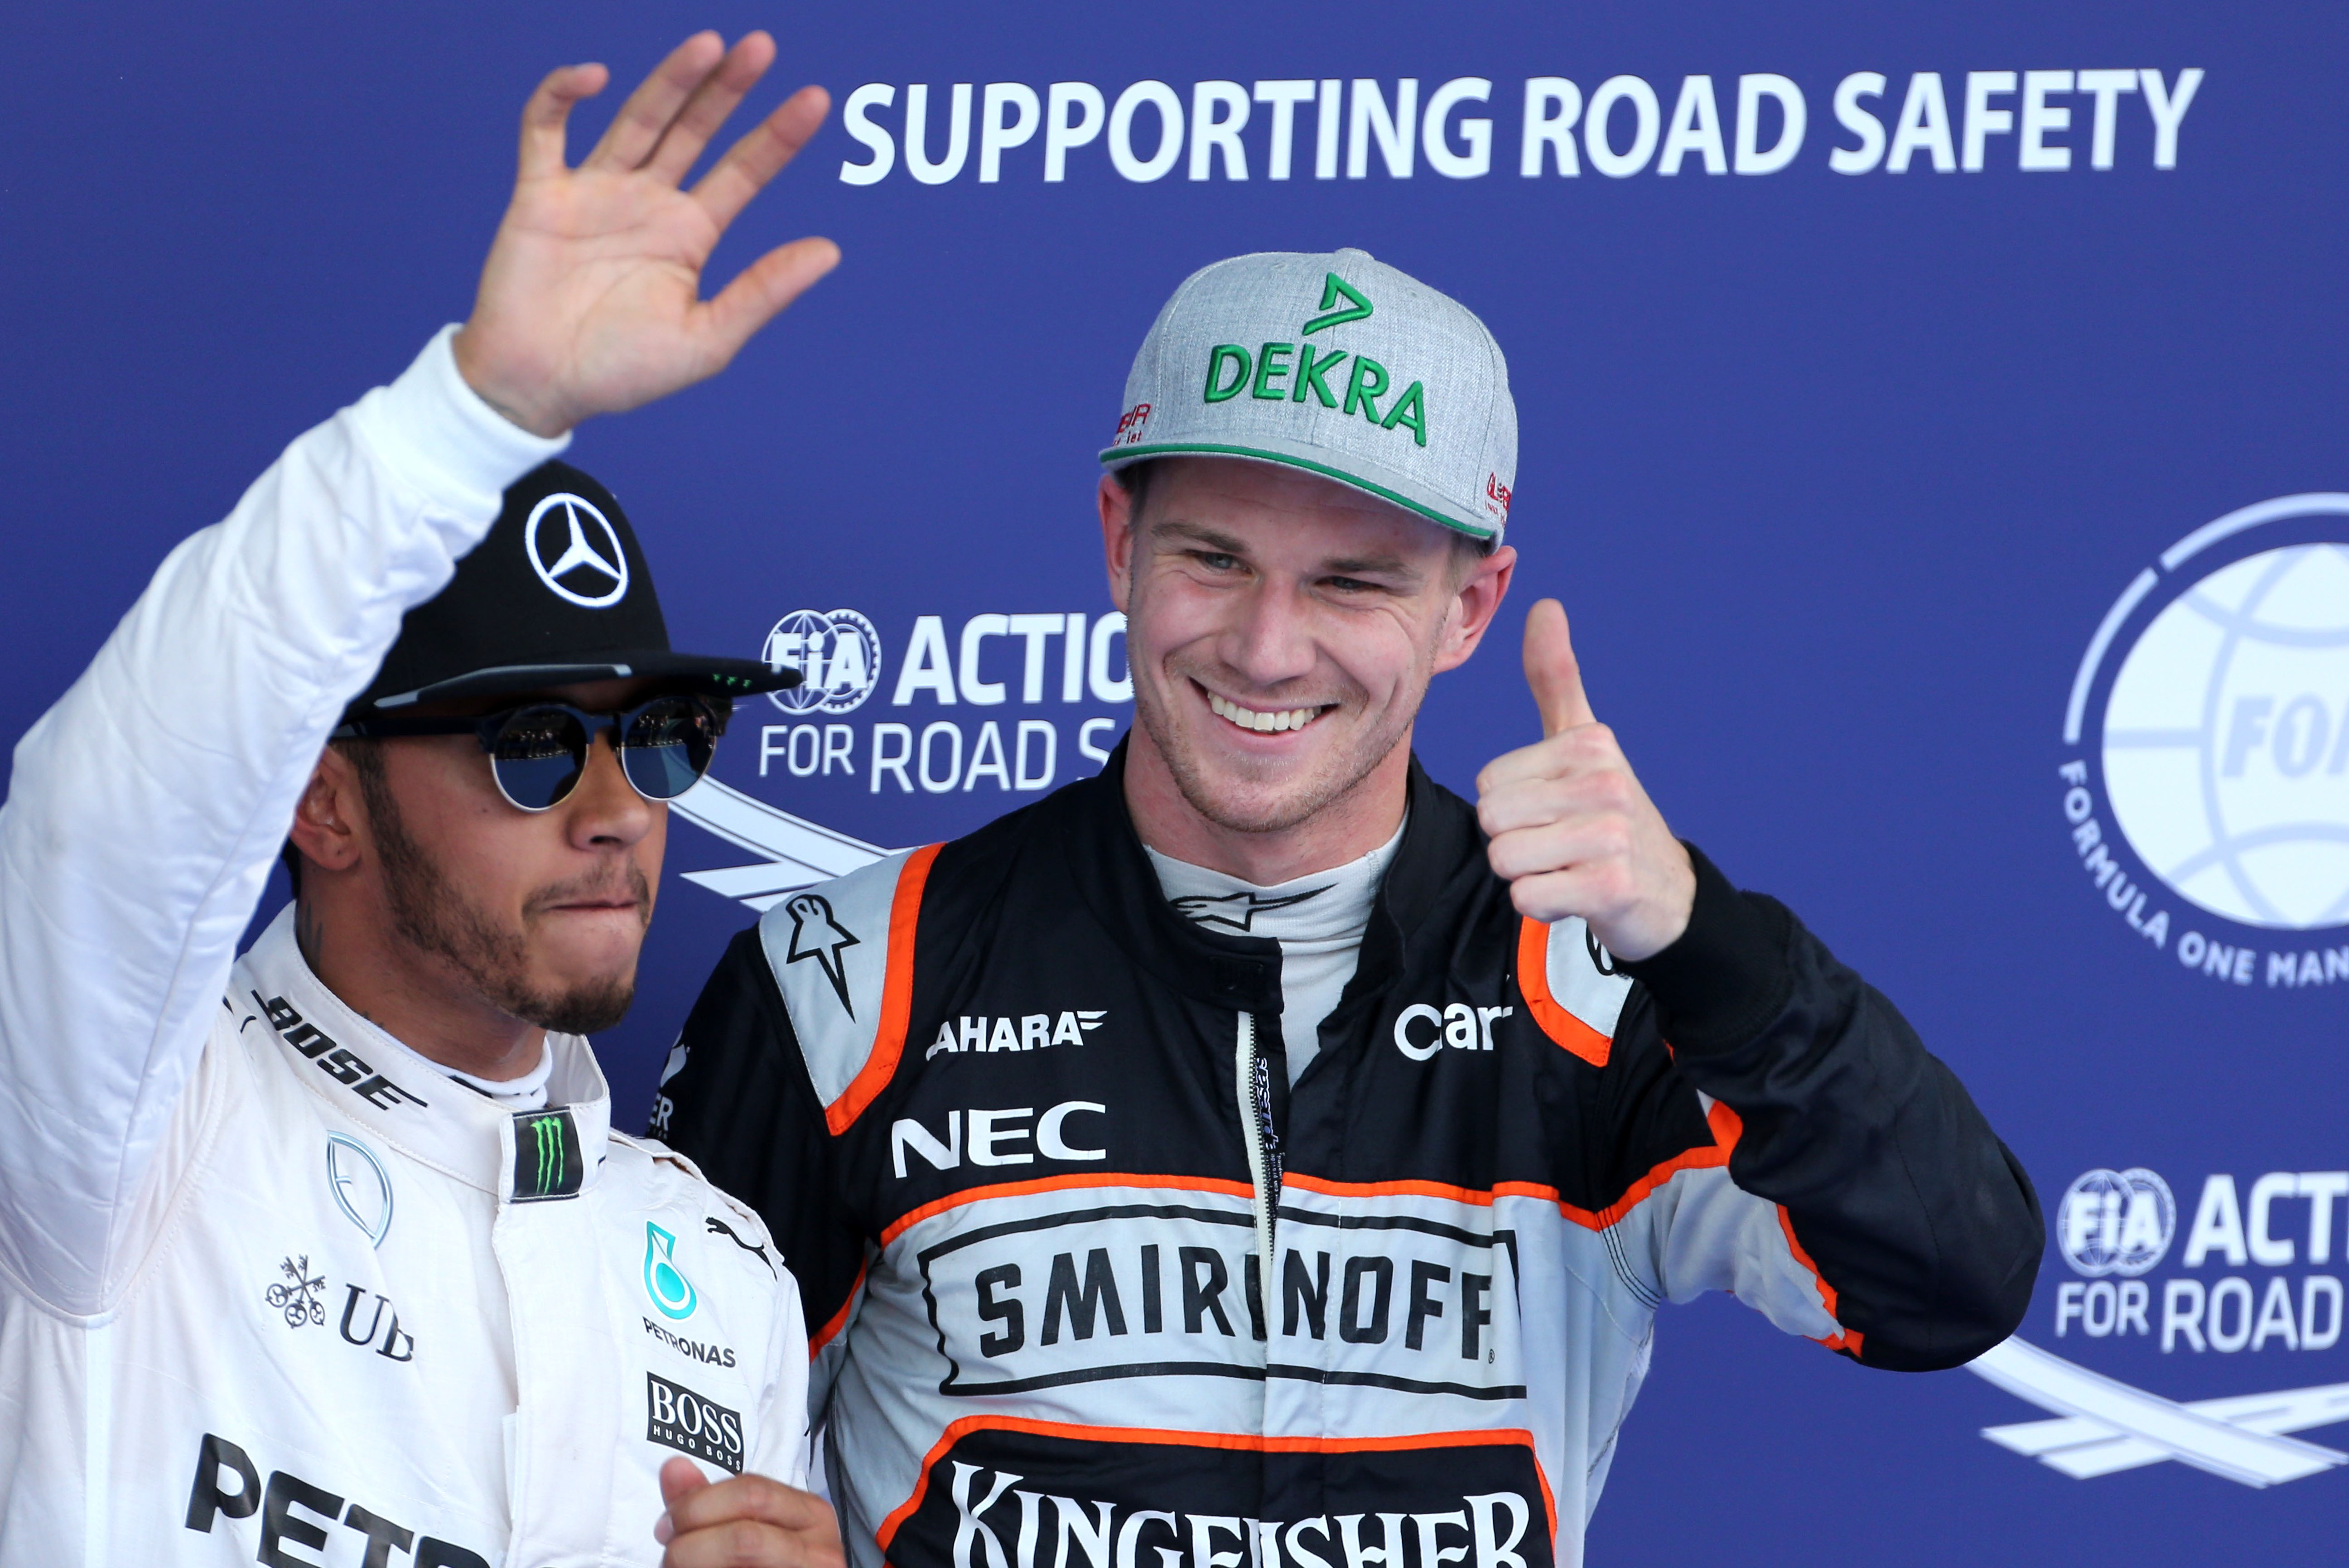 Lewis Hamilton, Nico Hulkenberg, Austrian Grand Prix qualifying, F1 2016